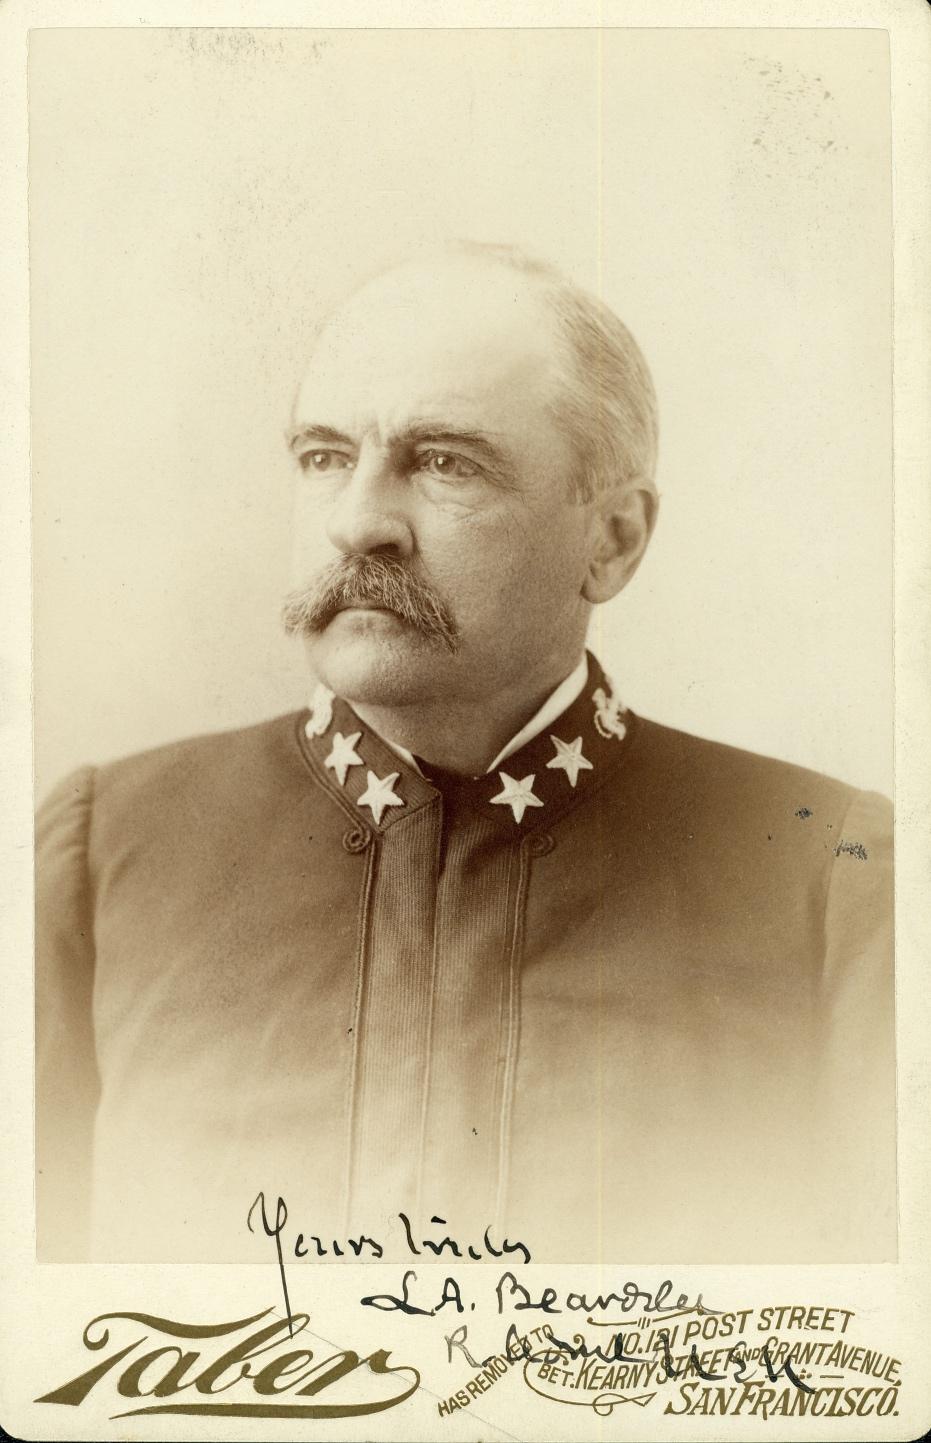 Admiral Lester A Beardslee